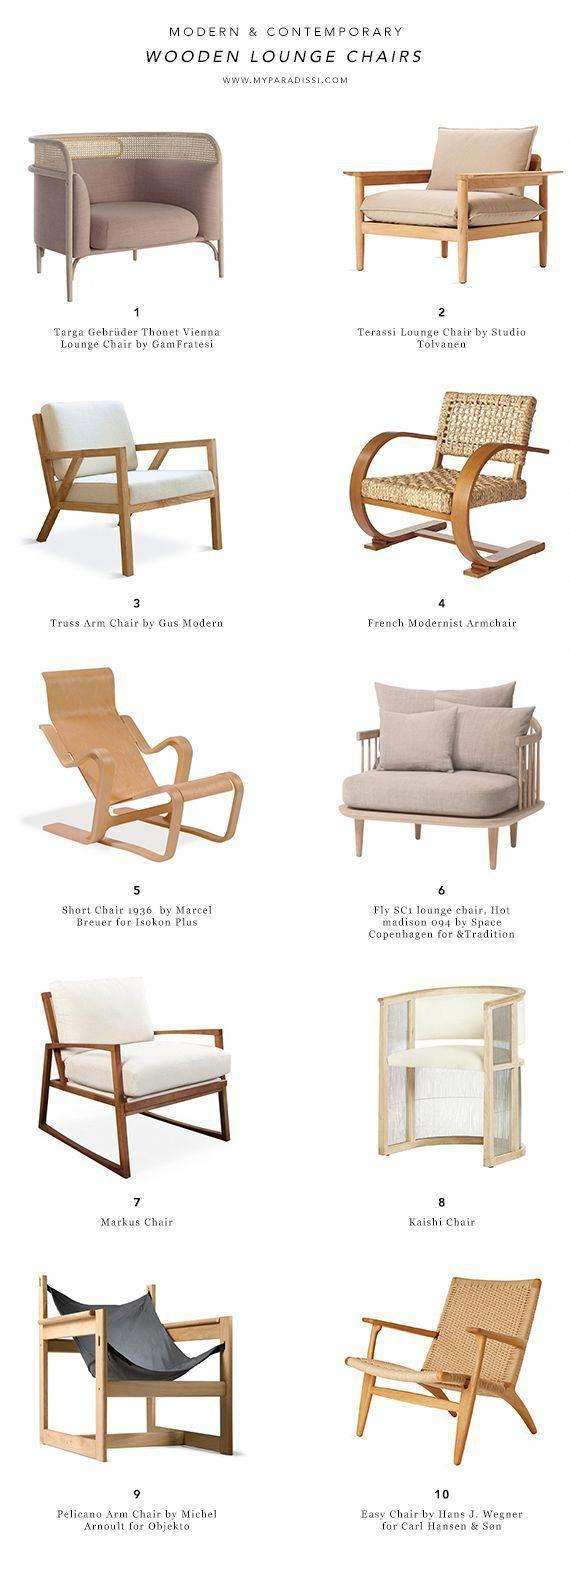 Awesome Modern And Contemporary Wooden Lounge Chairs Entourage Inzonedesignstudio Interior Chair Design Inzonedesignstudiocom